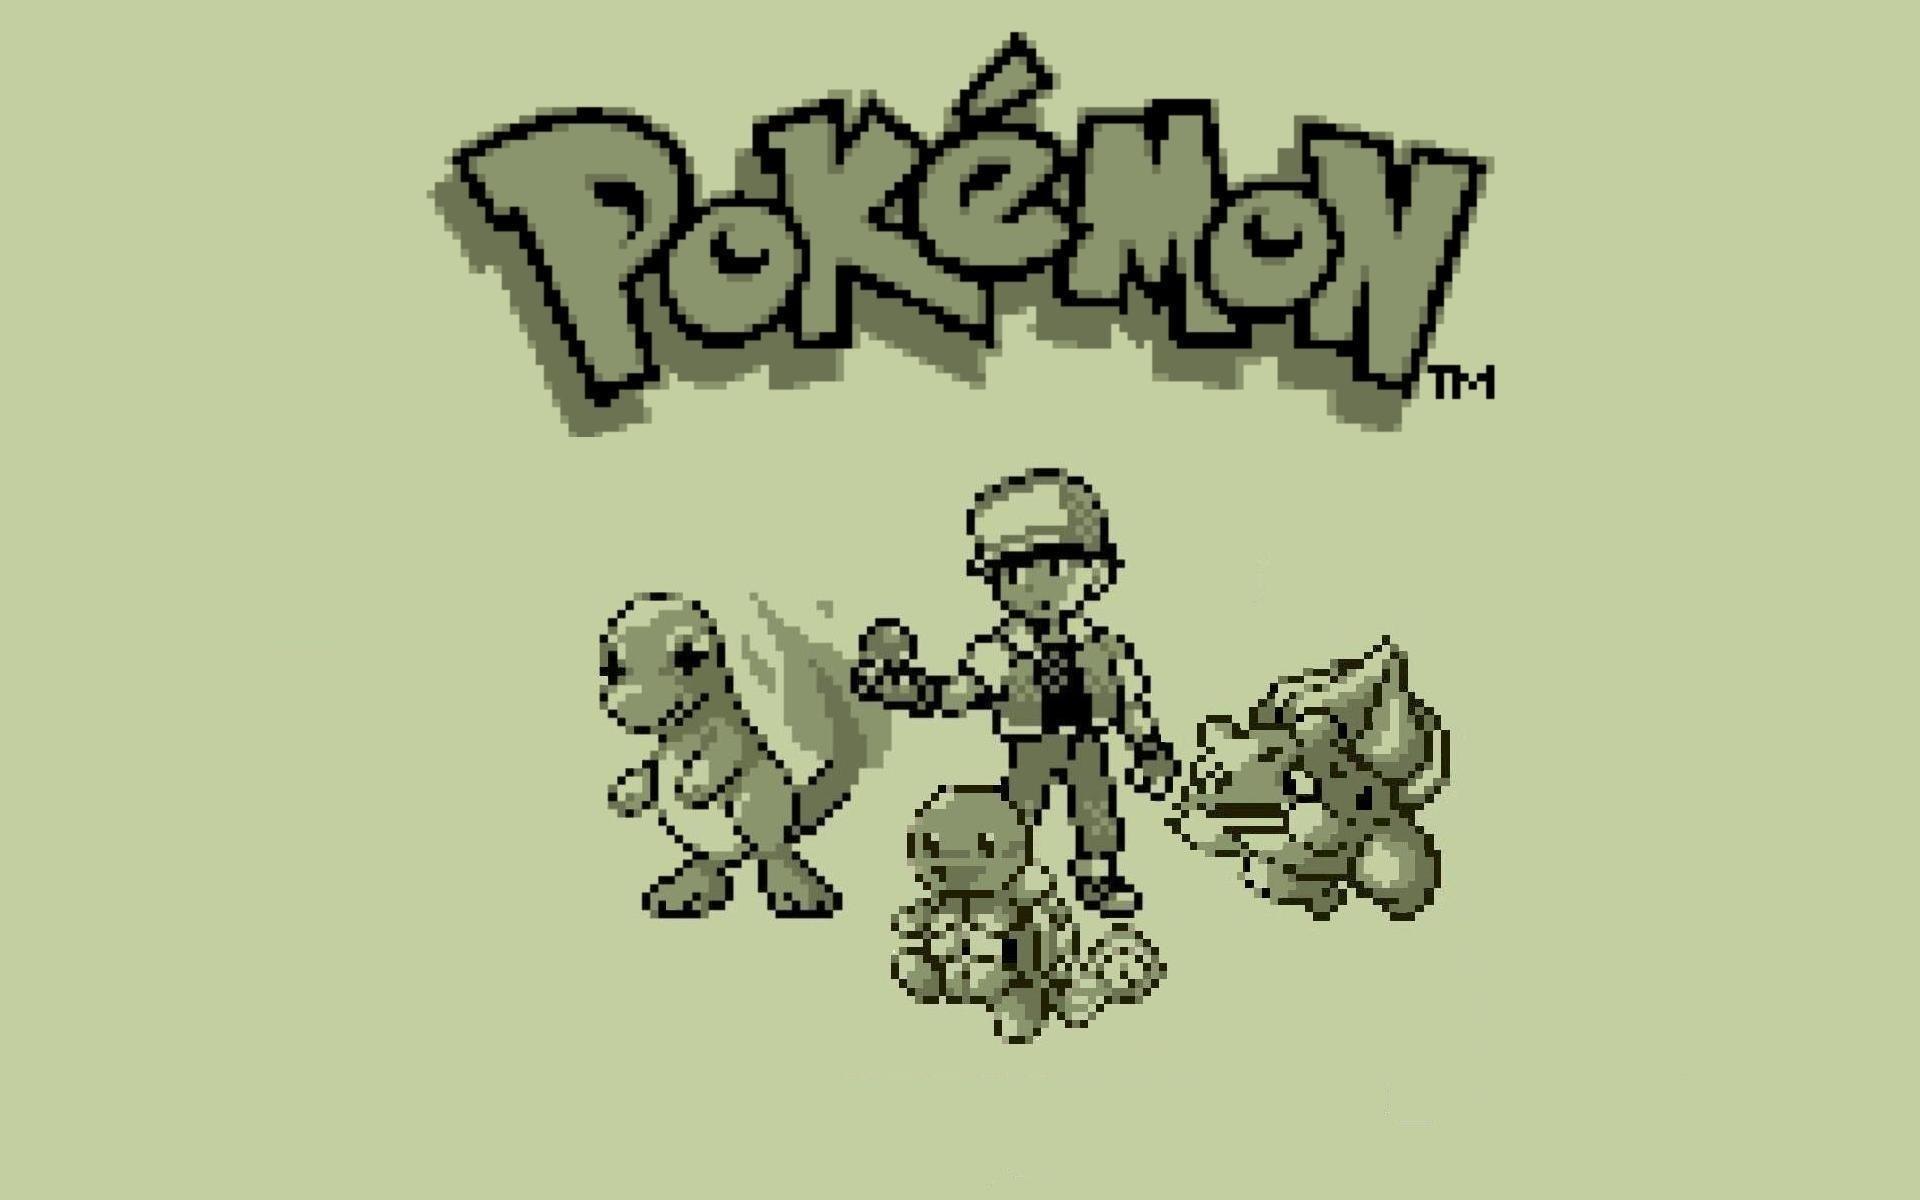 8-Bit Gameboy Pokemon Wallpaper